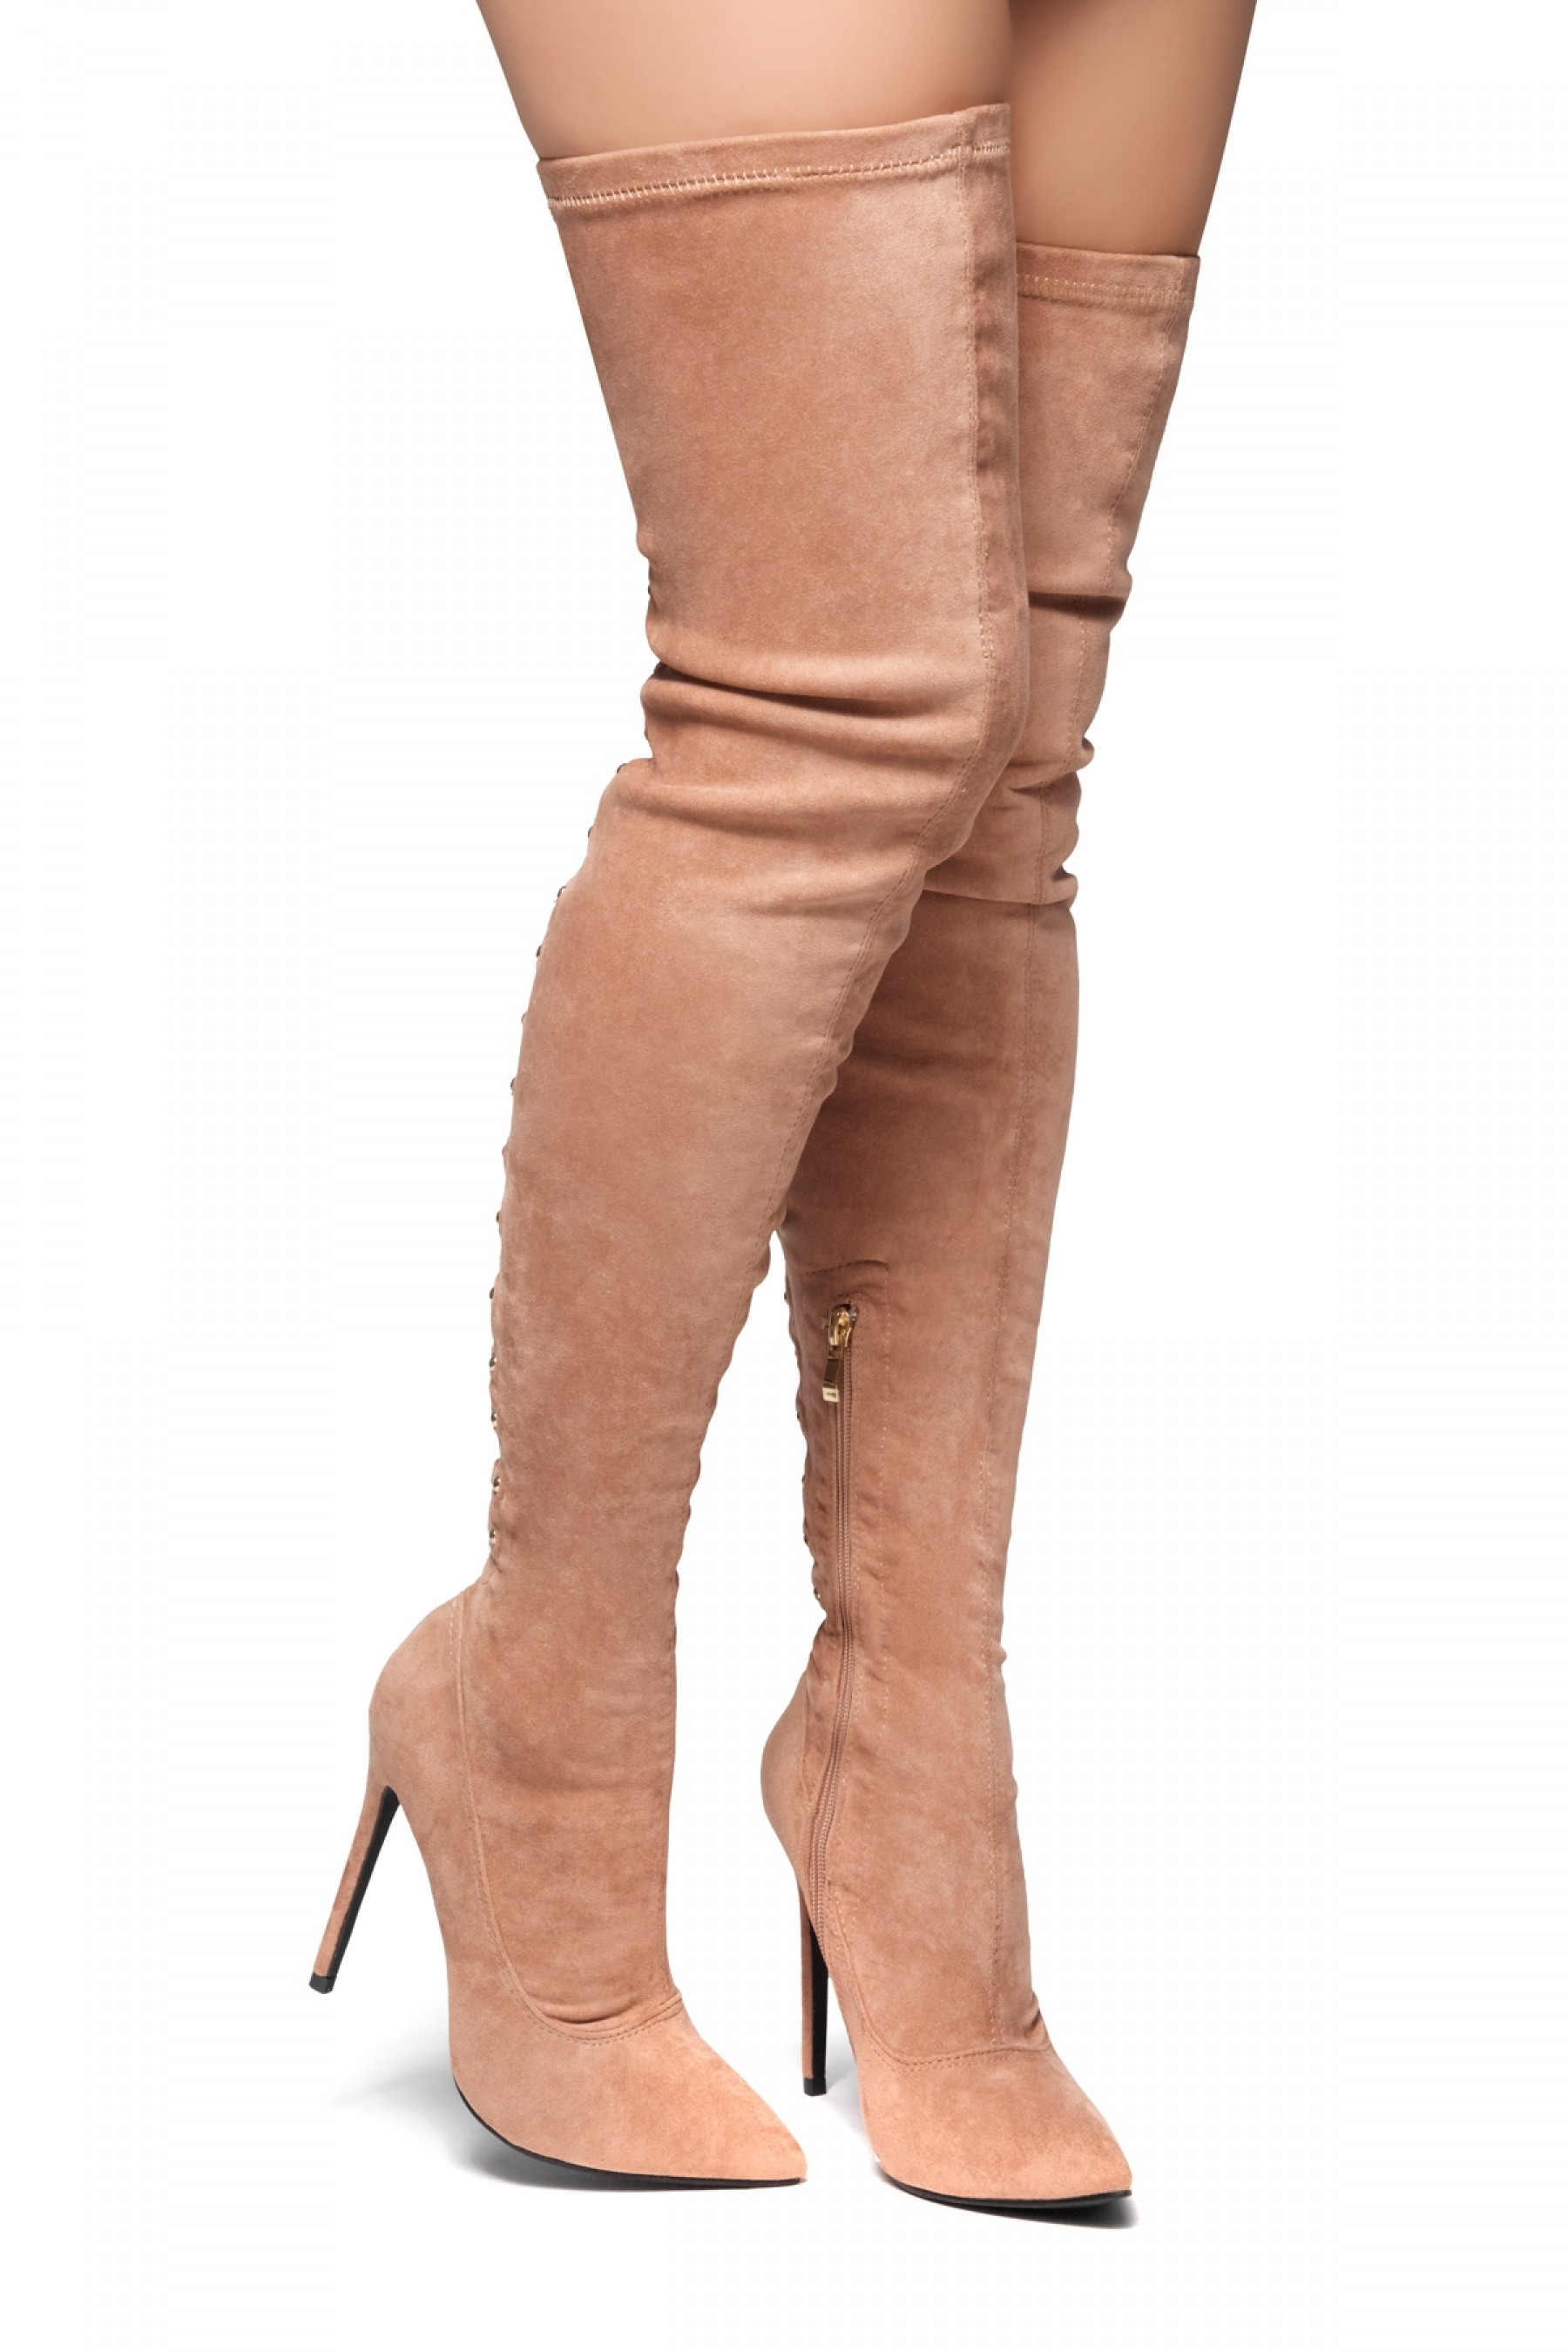 HerStyle Cessi-Stiletto heel, Thigh high, nail head detail (Mauve)